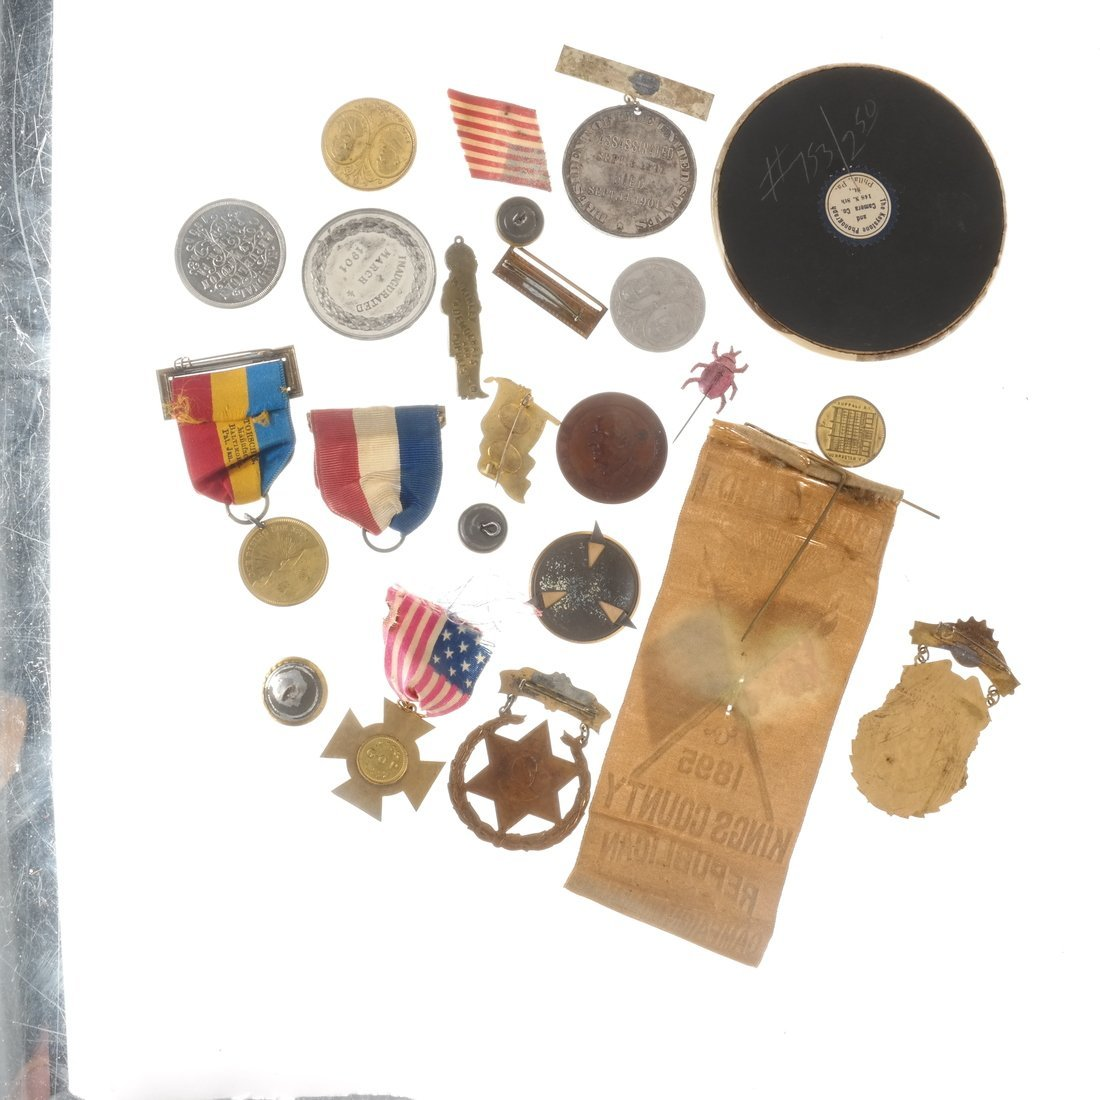 William McKinley - Campaign and Memorial Items - 2